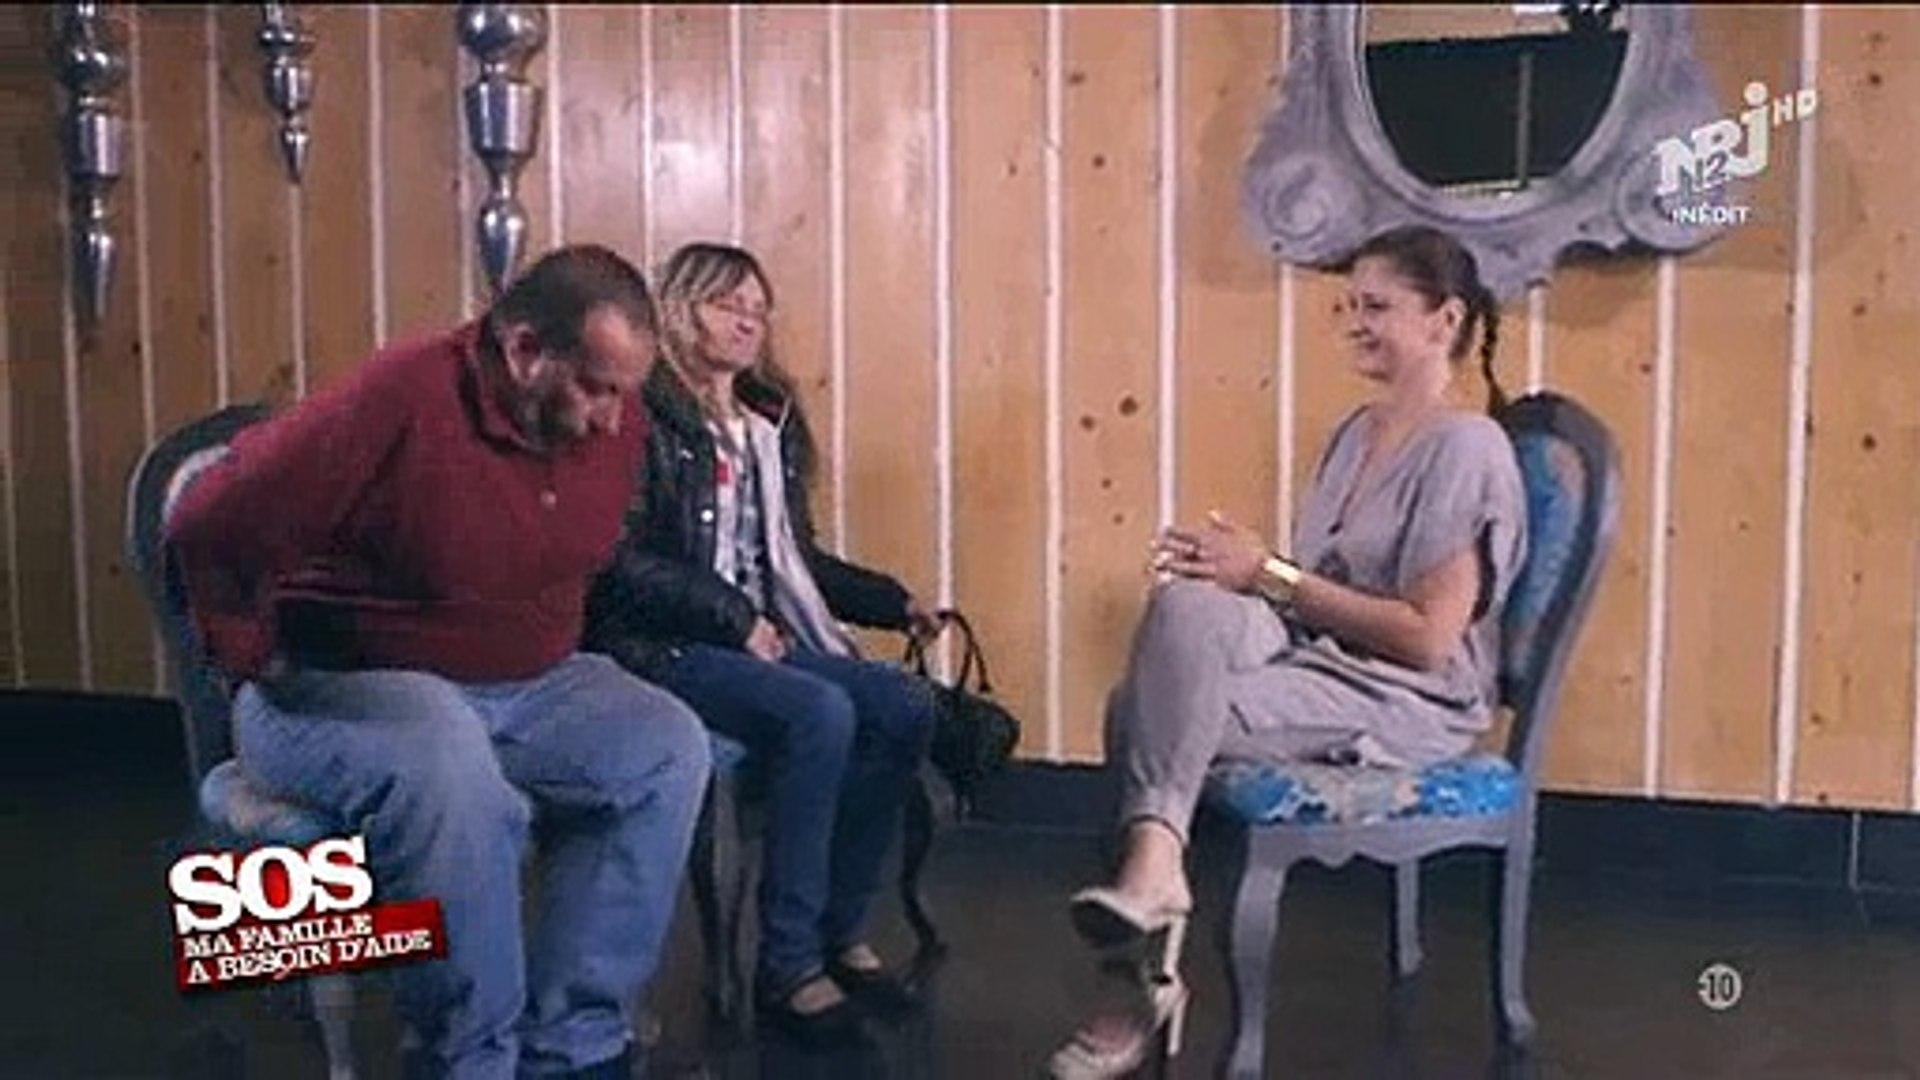 Femme regarder mari chicago érotiques, massage @todorazor.com